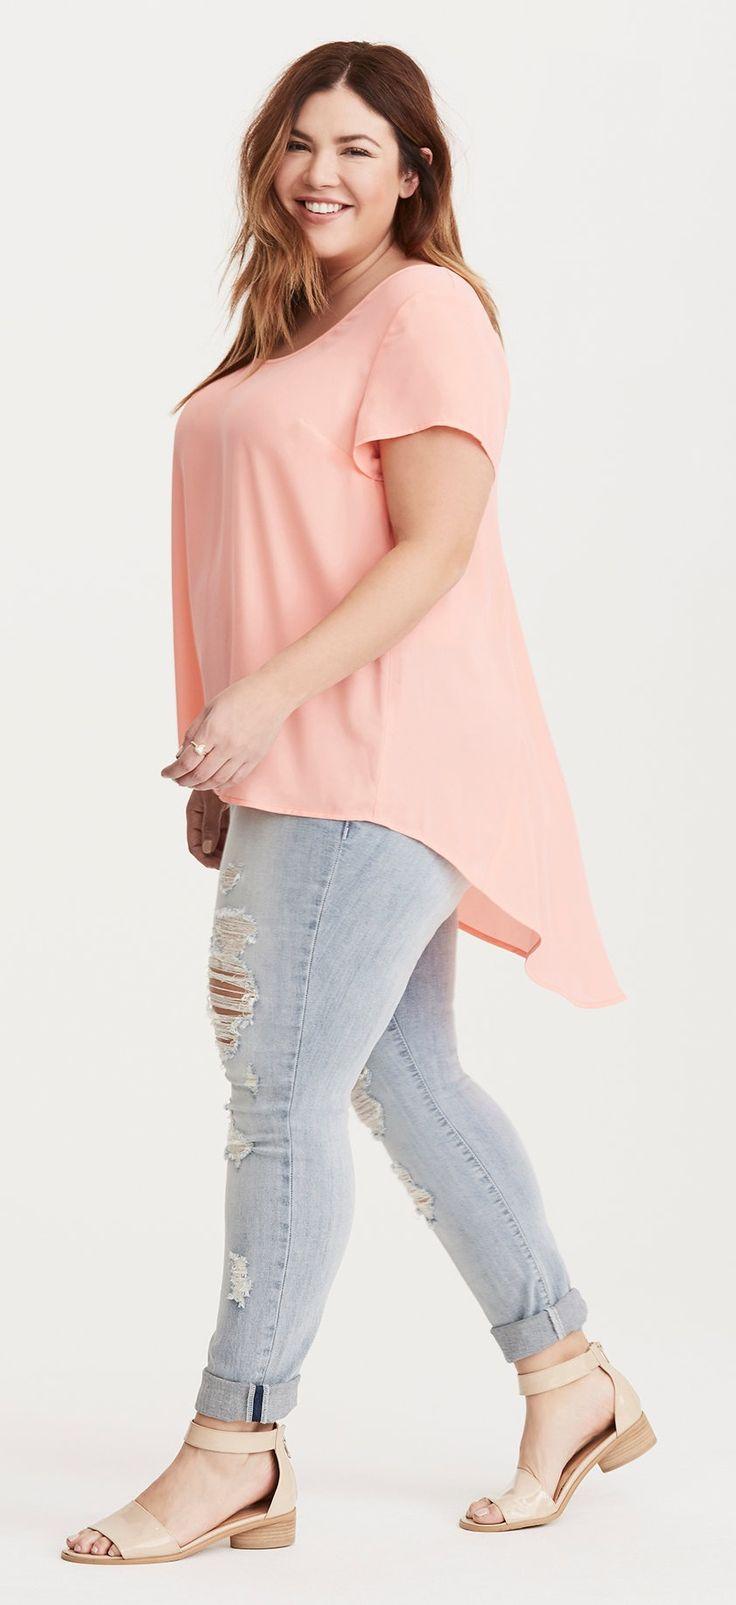 25 best ideas about Plus size casual on Pinterest  Plus size Plus size women and Curvy clothes